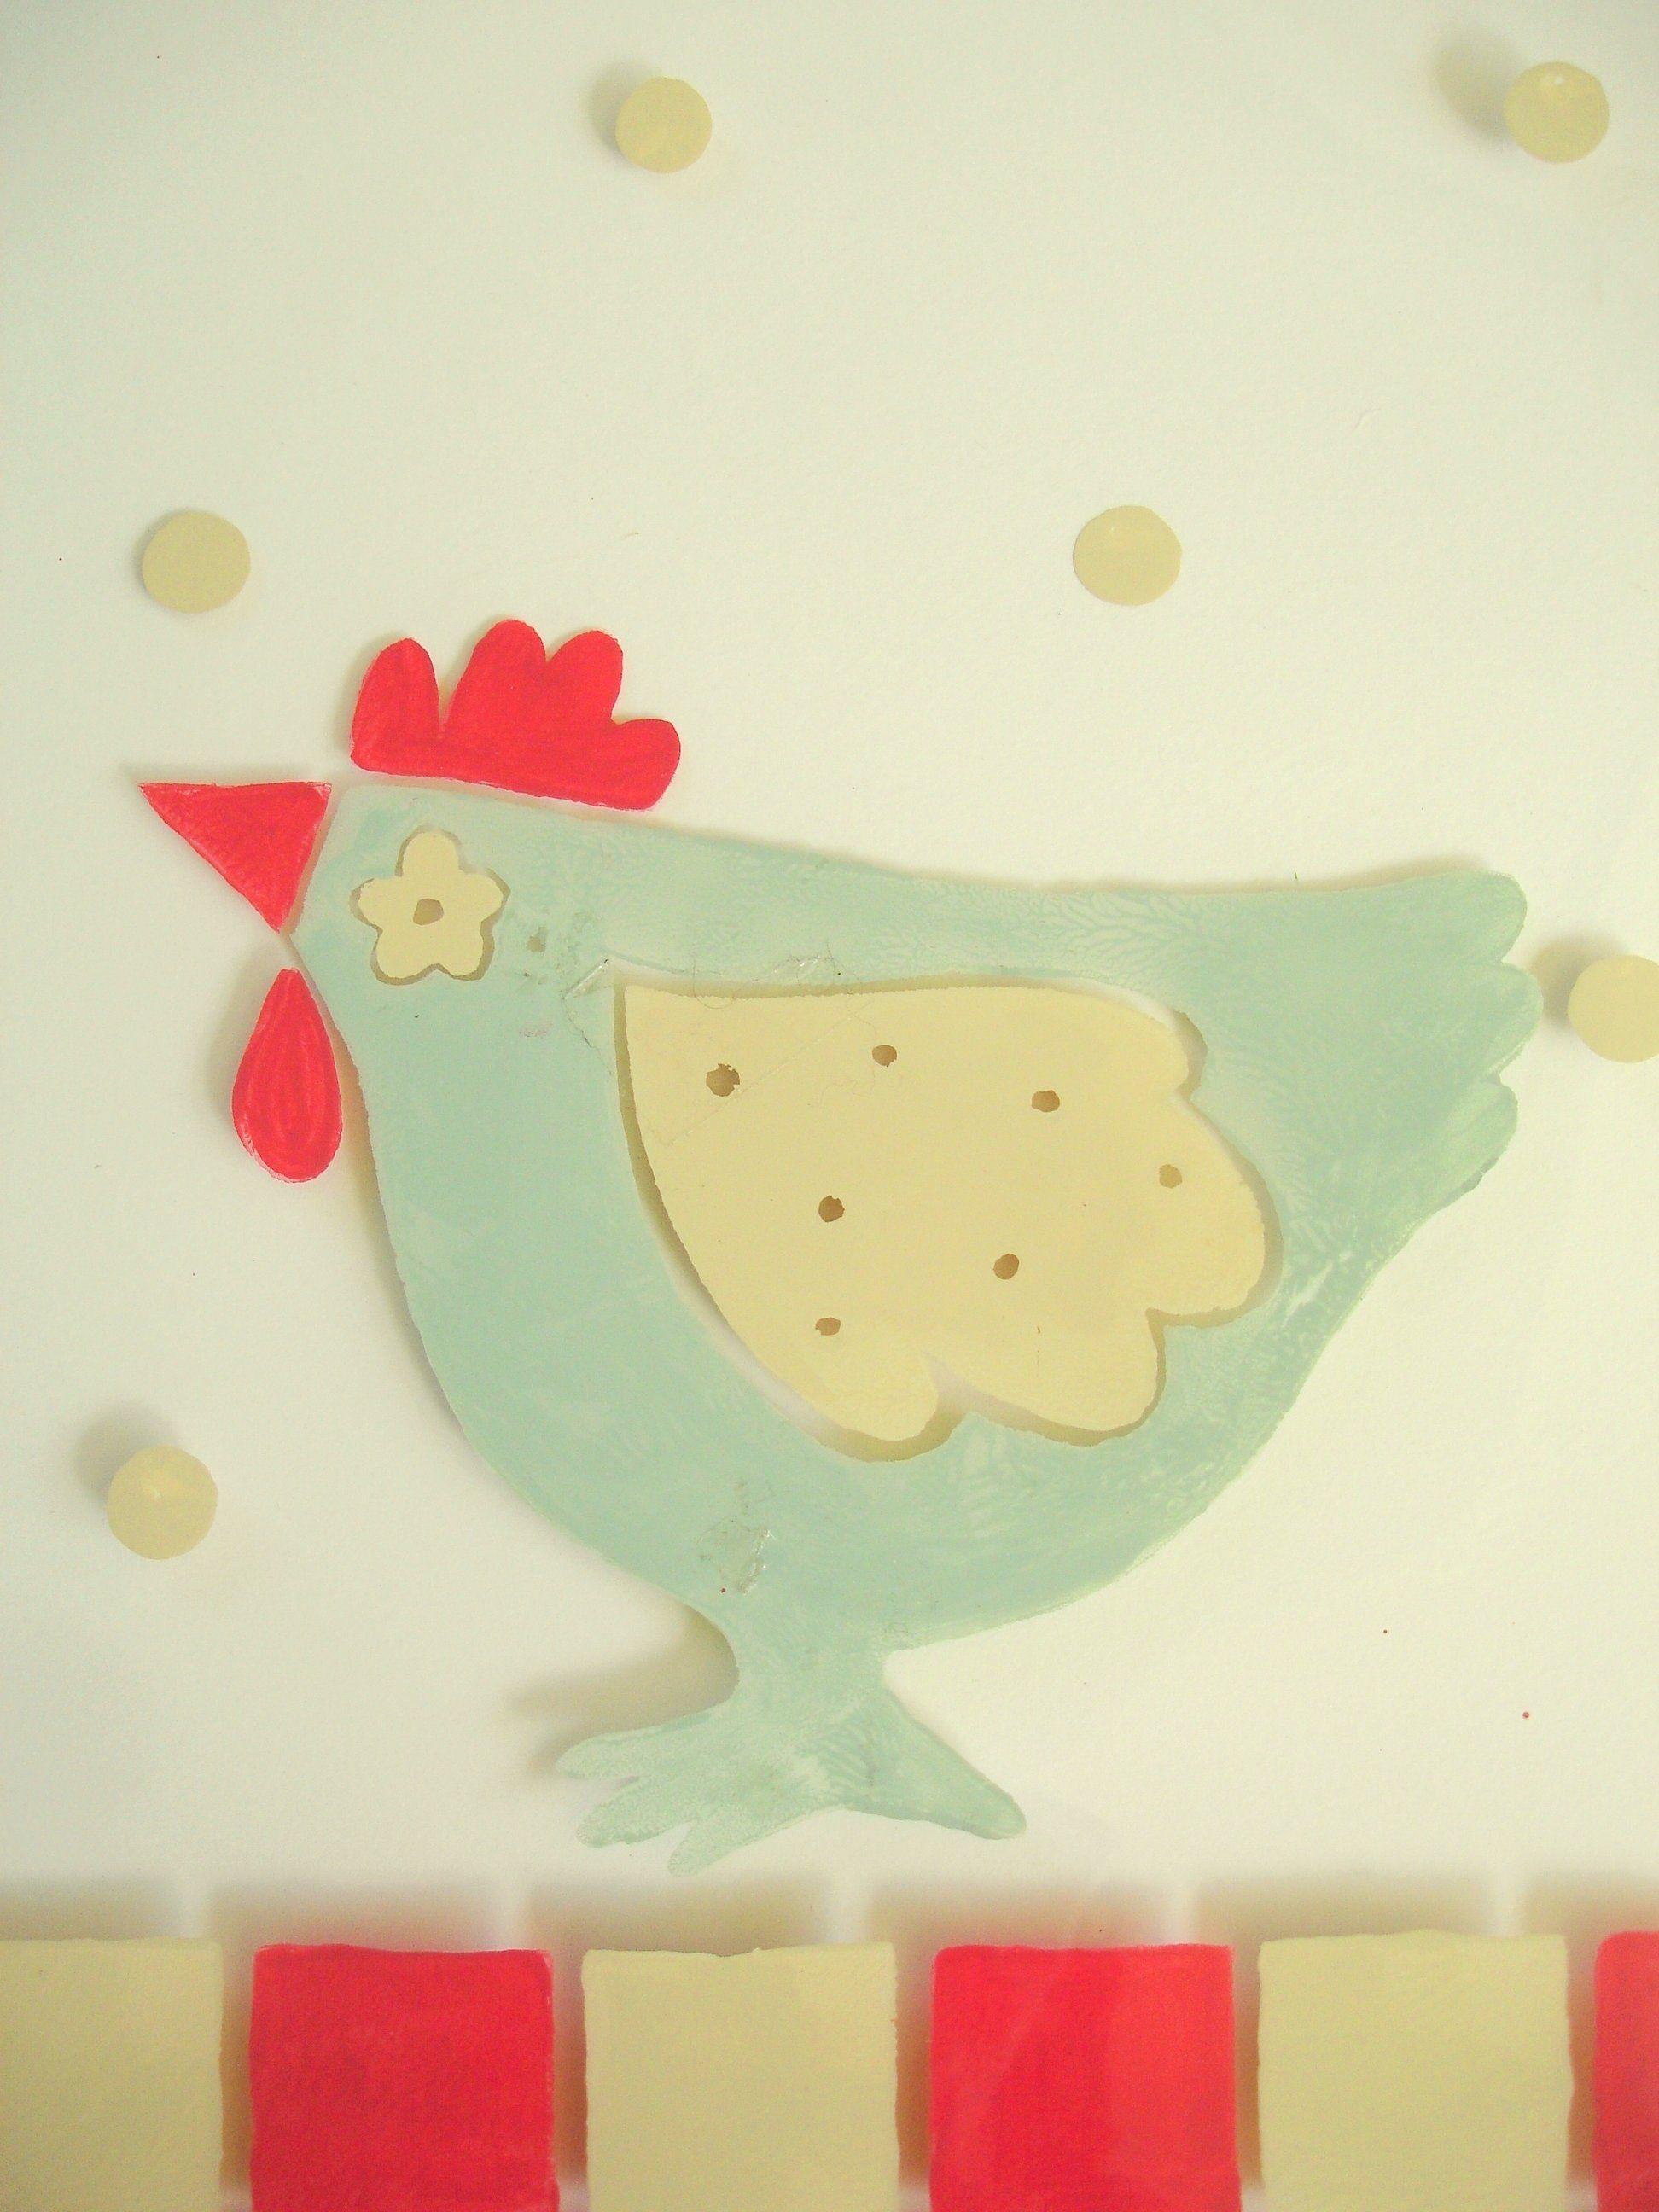 chicken design for a Bespoke glass splash back by Josephine ...